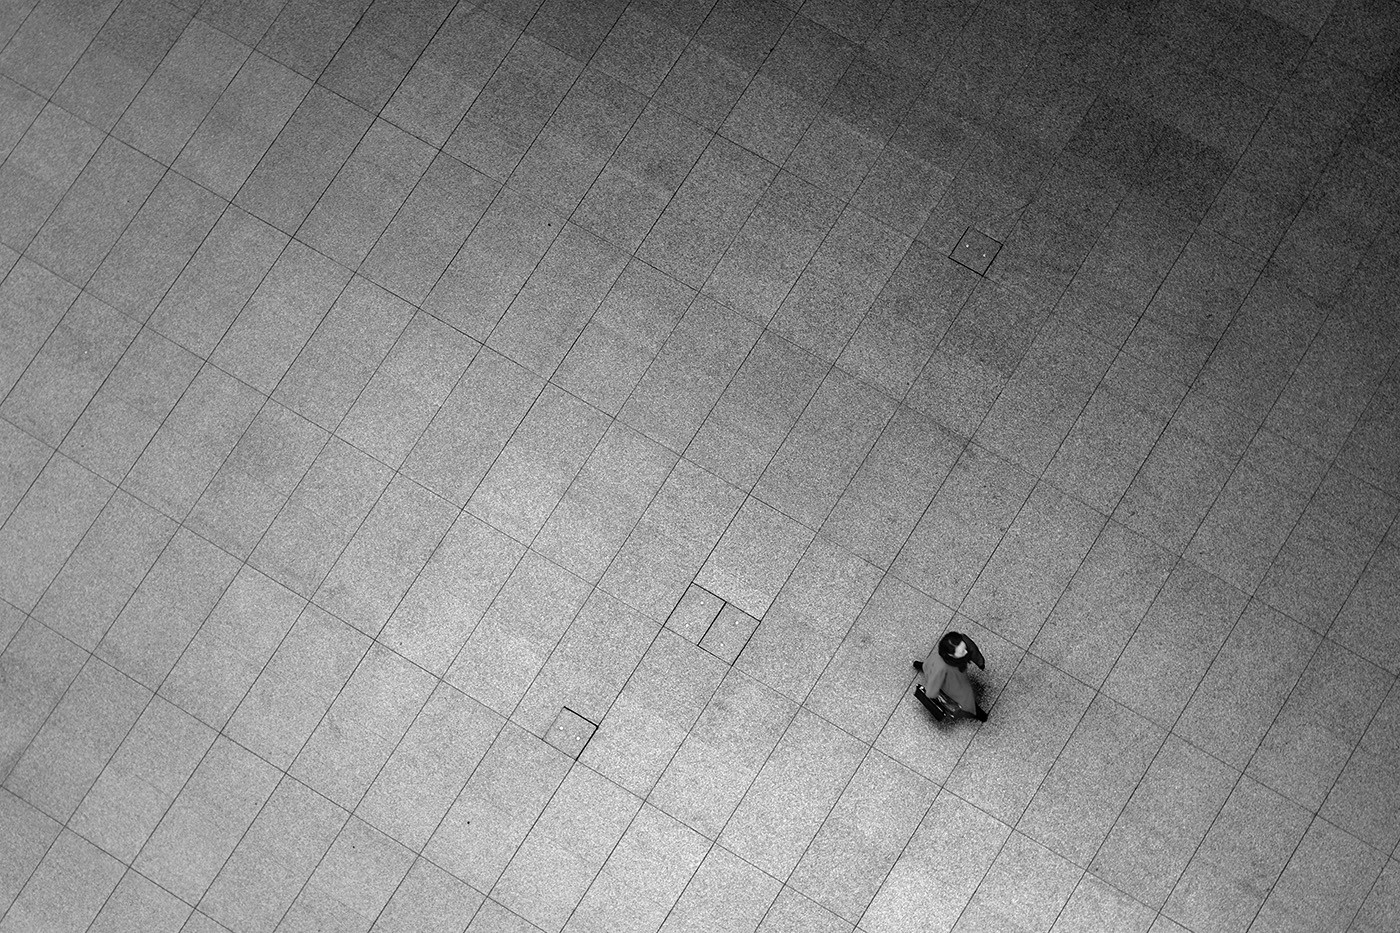 Marco Schweier: Distanz